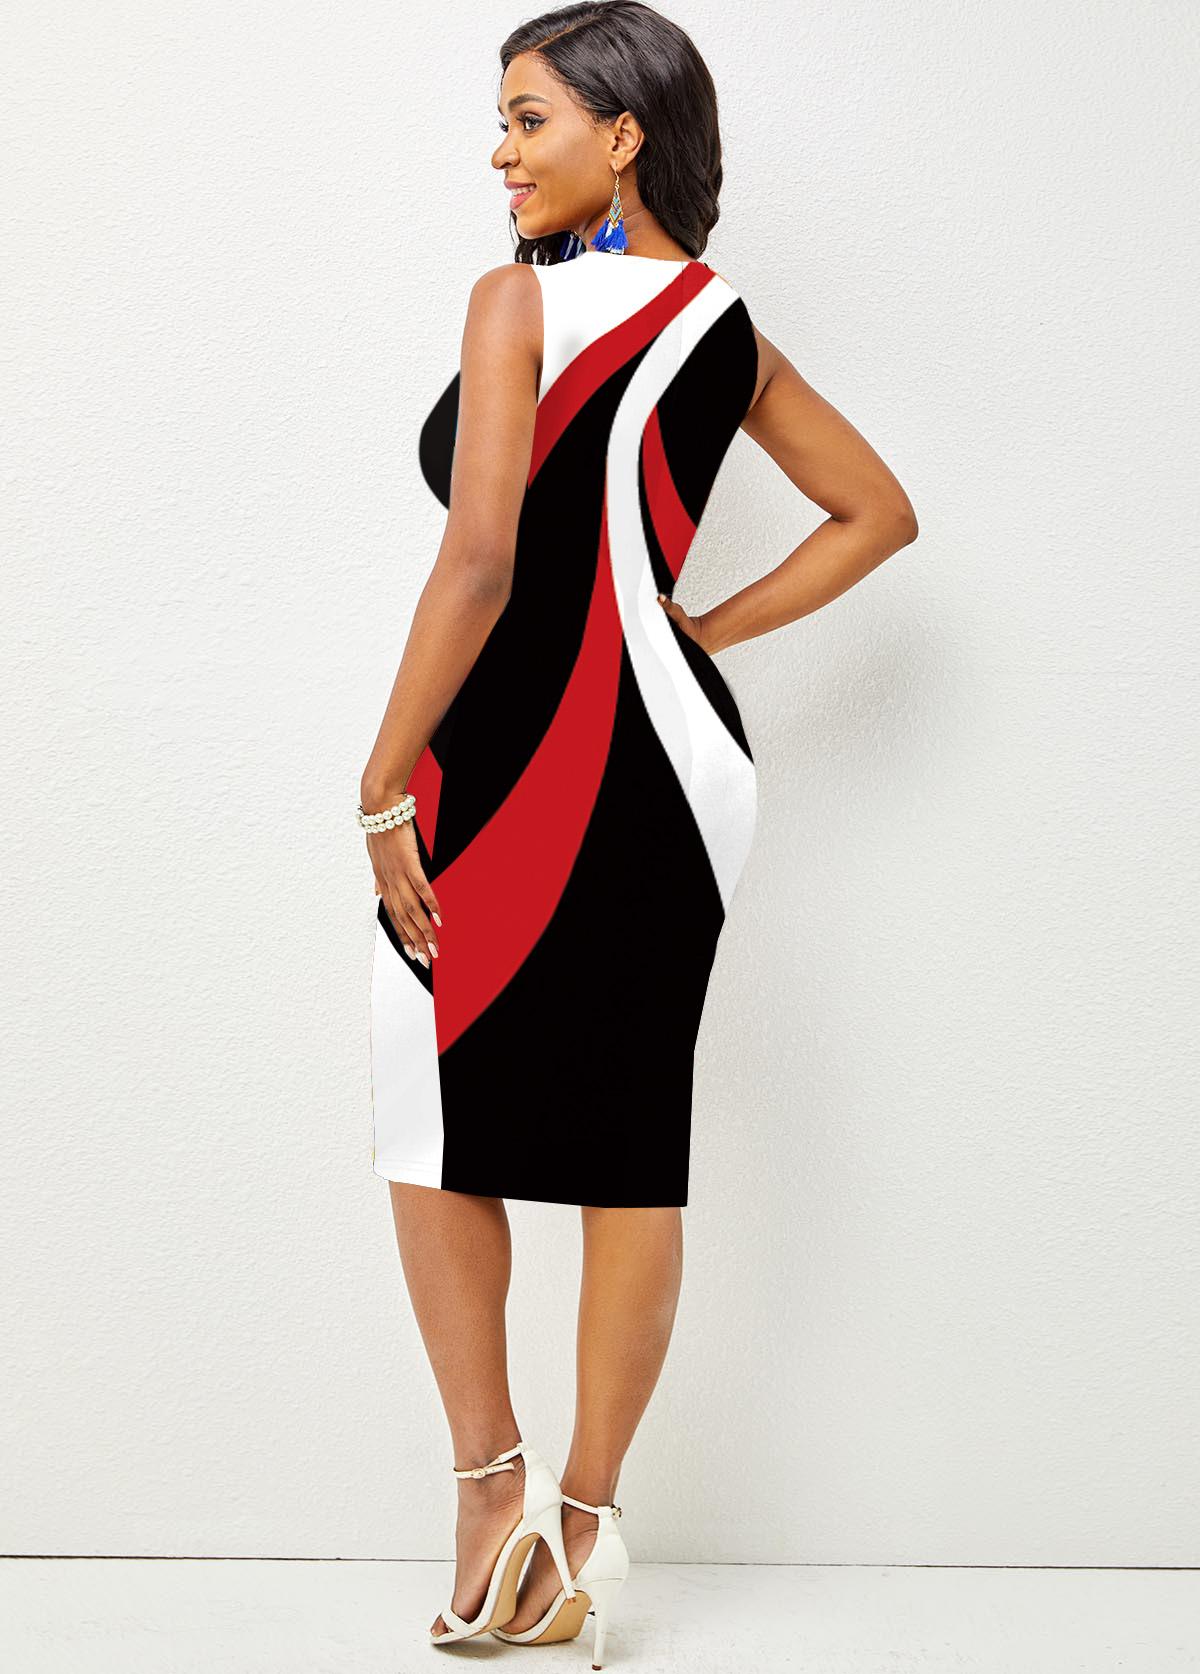 Contrast Printed Sleeveless Round Neck Dress